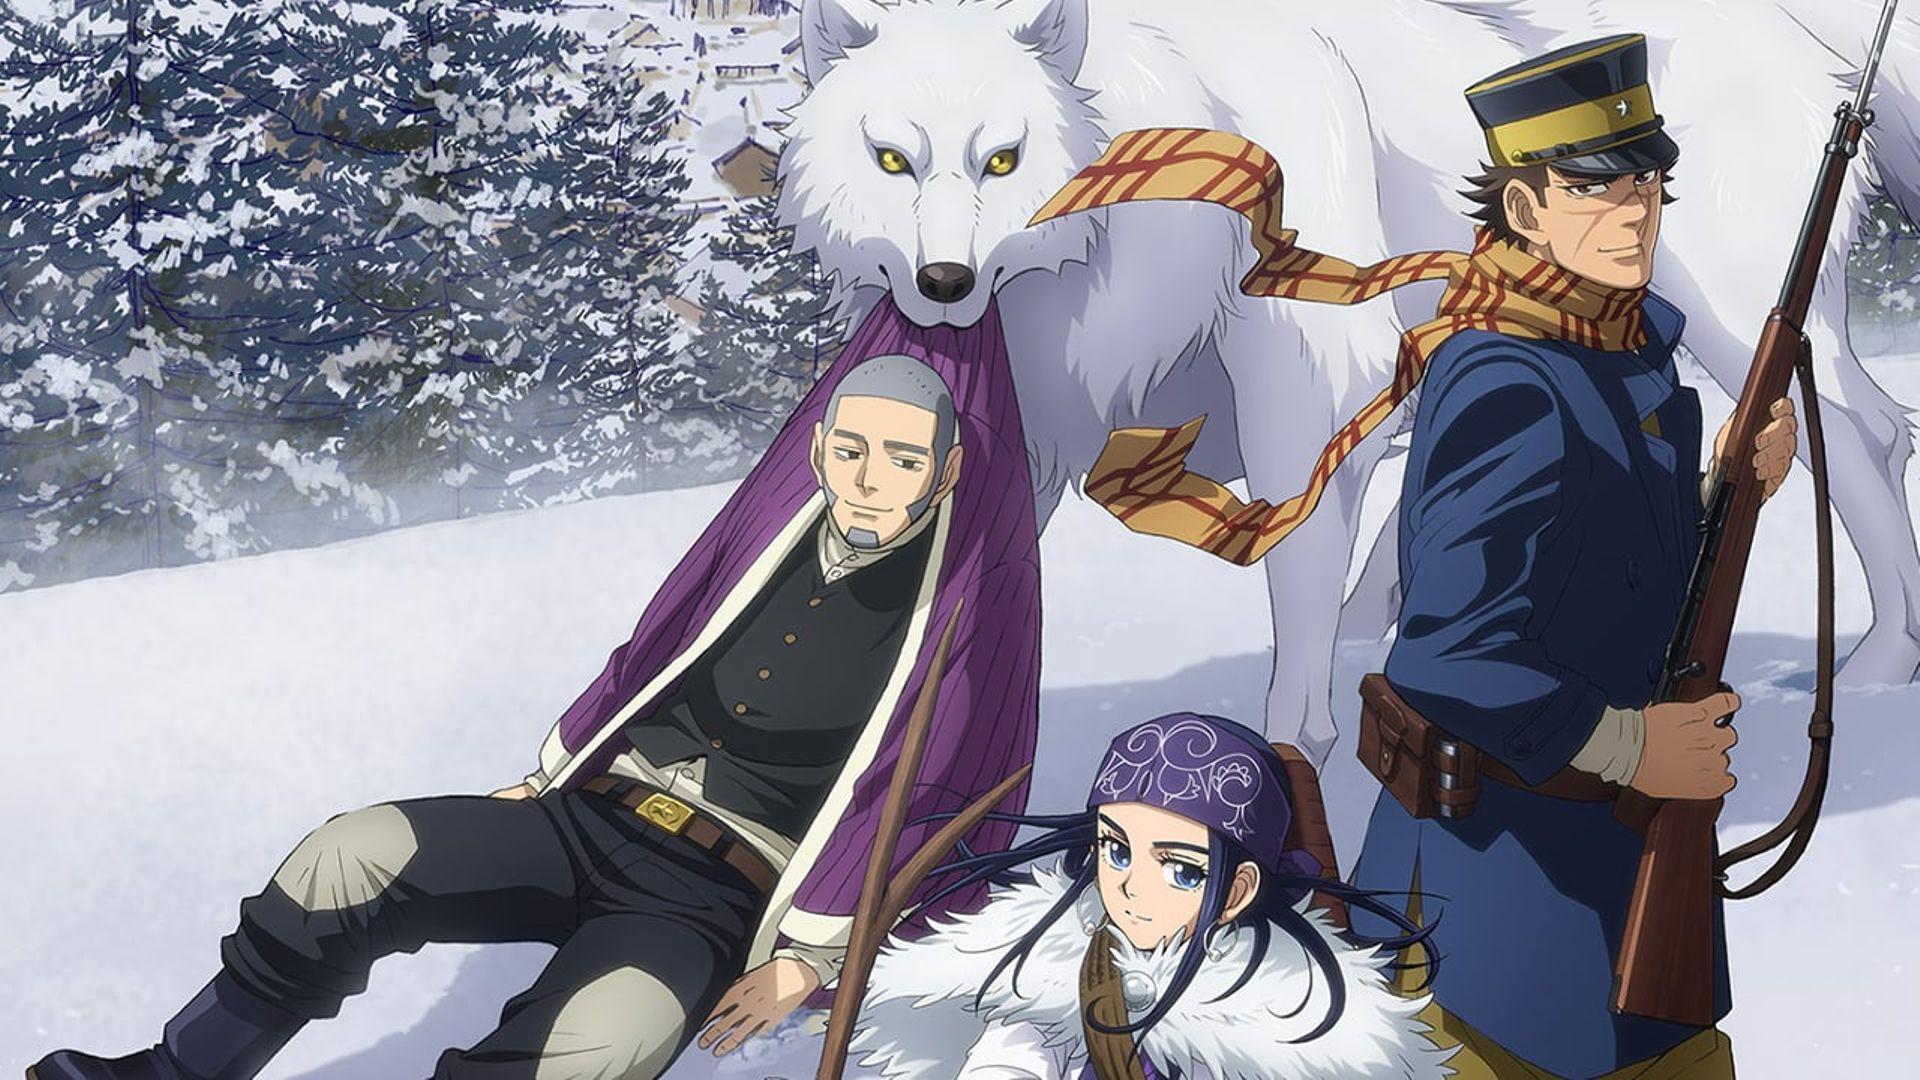 Treasure hunt anime Golden Kamuy, like To Your Eternity